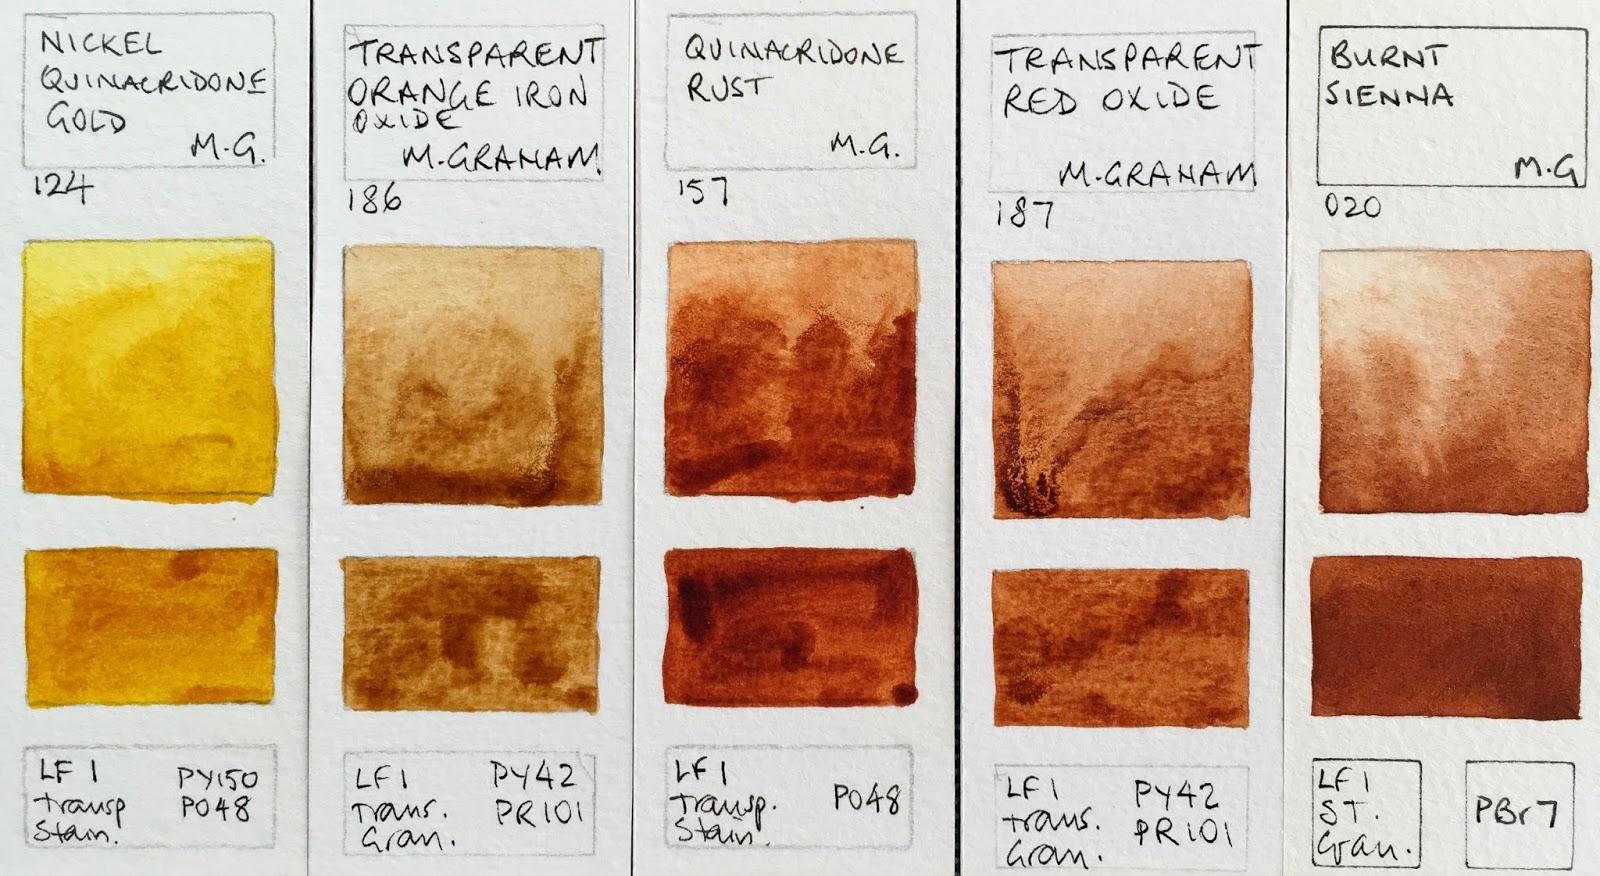 Maham watercolours nicke quinacridone gold transparent orange iron oxide rust red burnt sienna also jane blundell artist rh janeblundellartspot